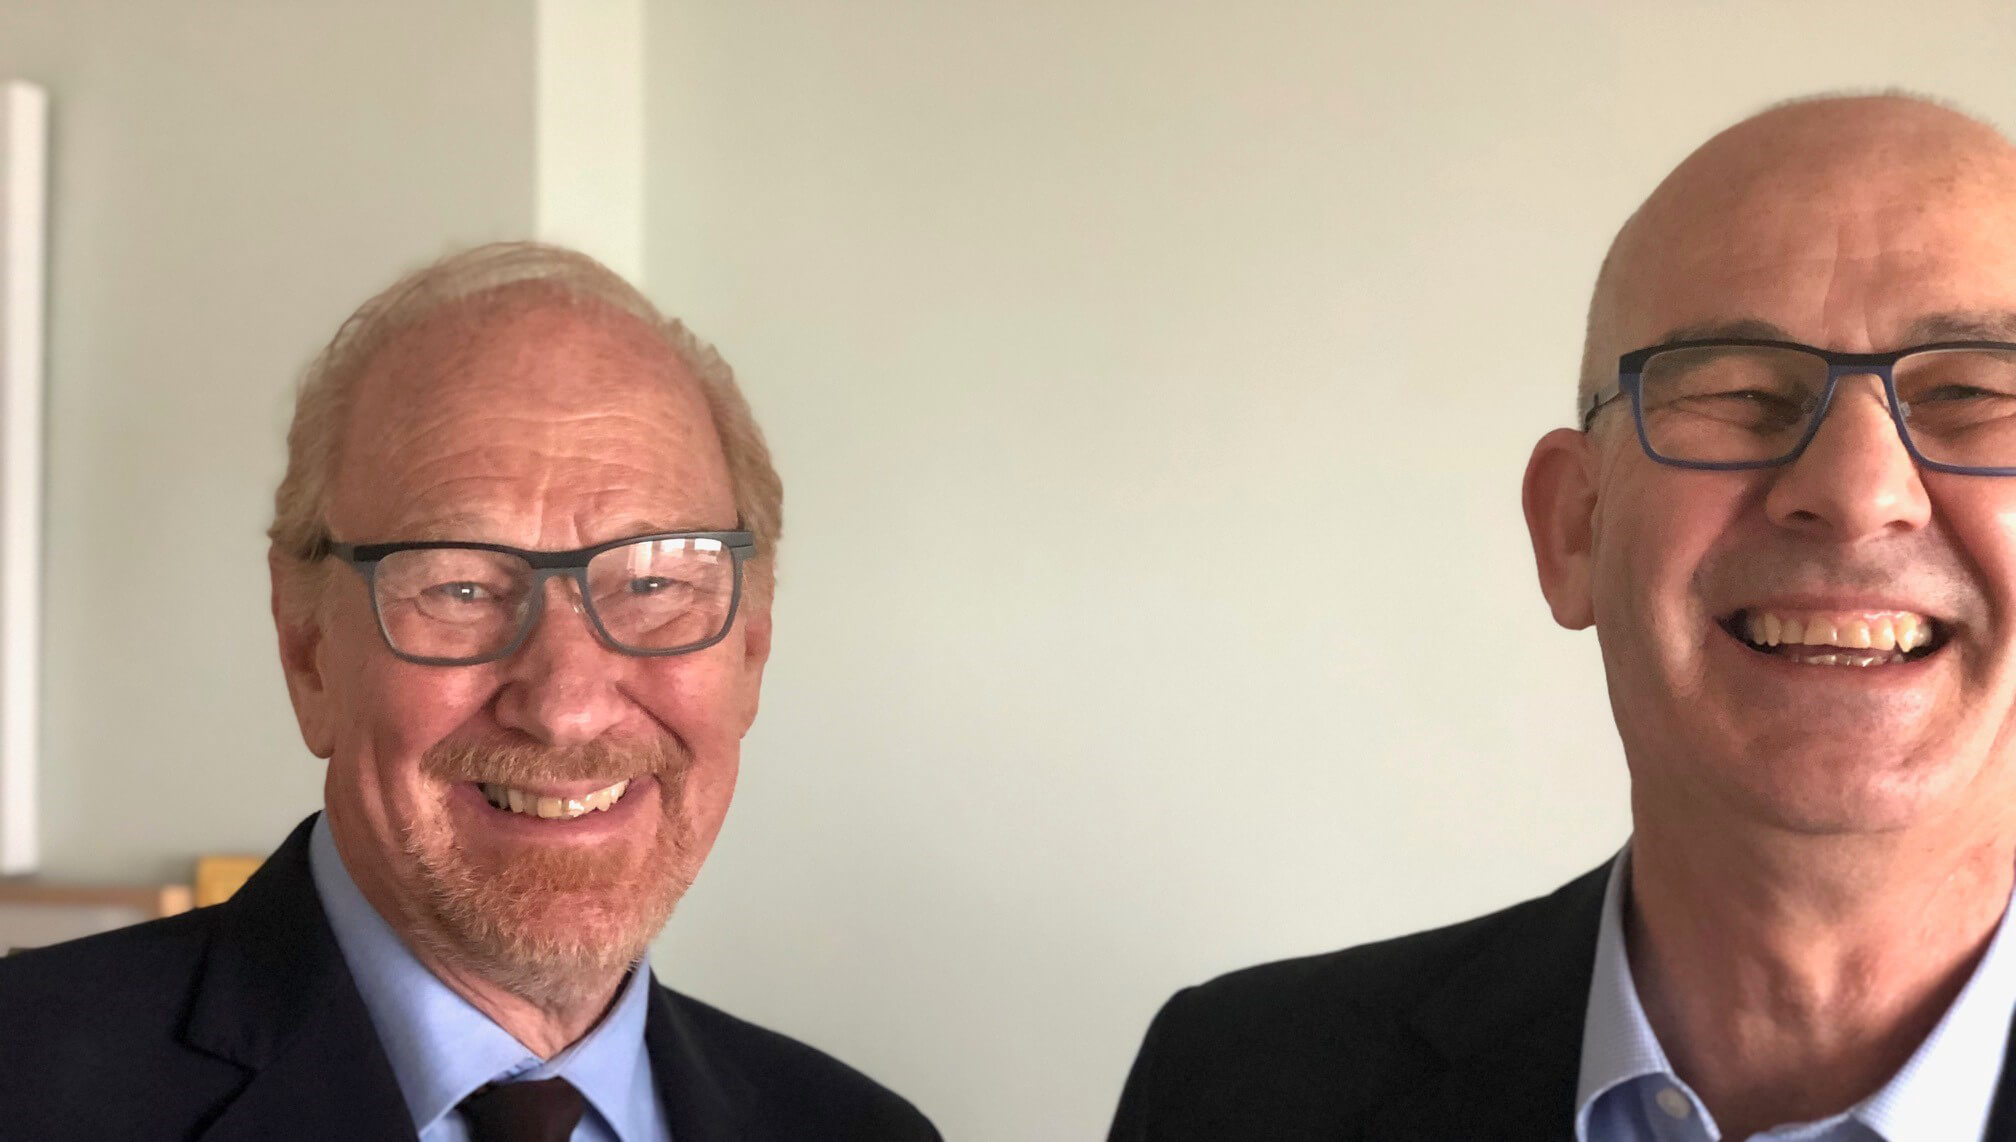 Meet Kiwi entrepreneur and inventor, Frank Austin, with Paul Austin